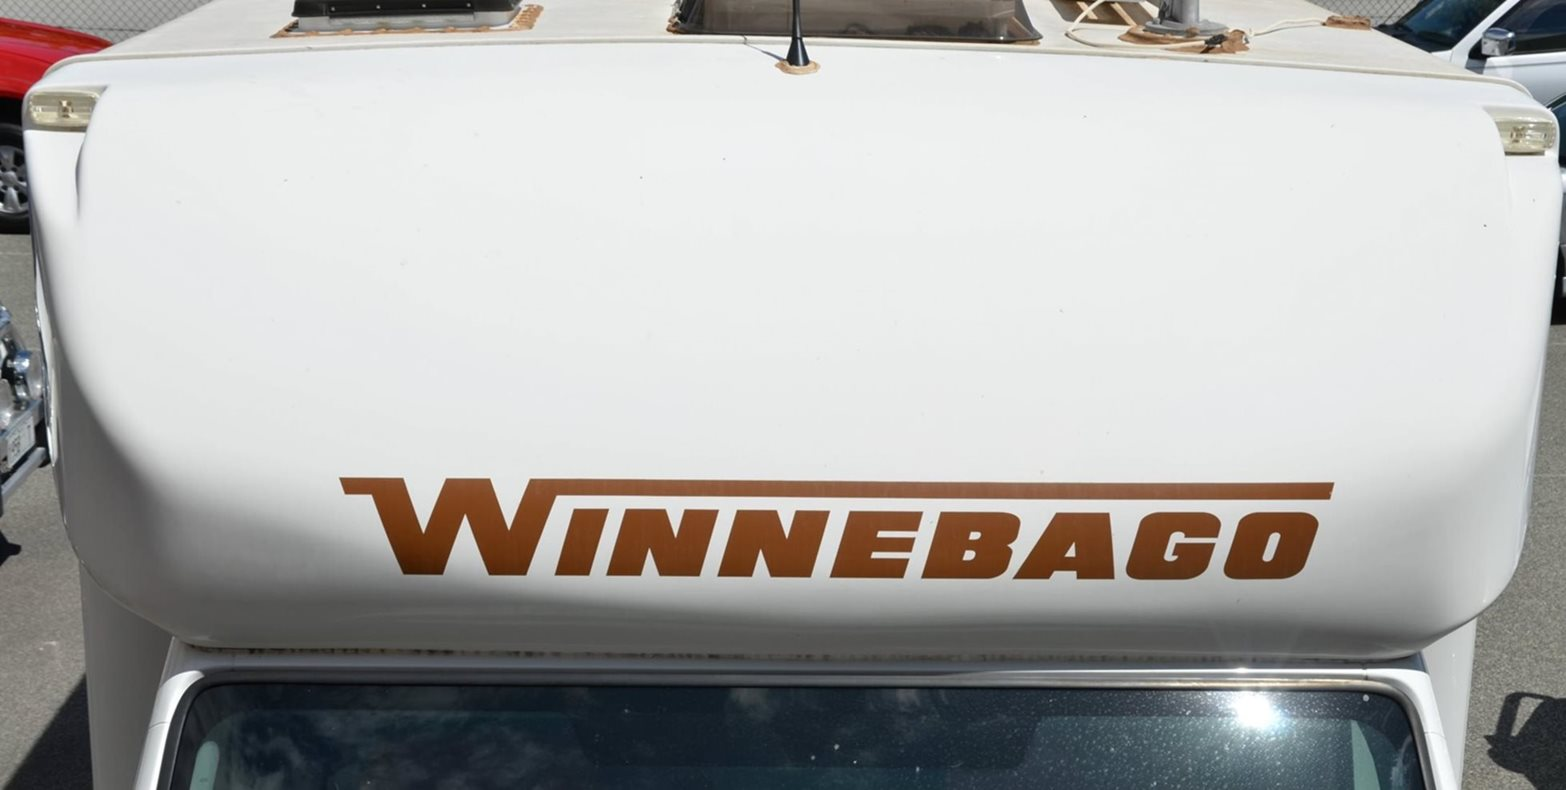 Winnebago nose cones are known for fading